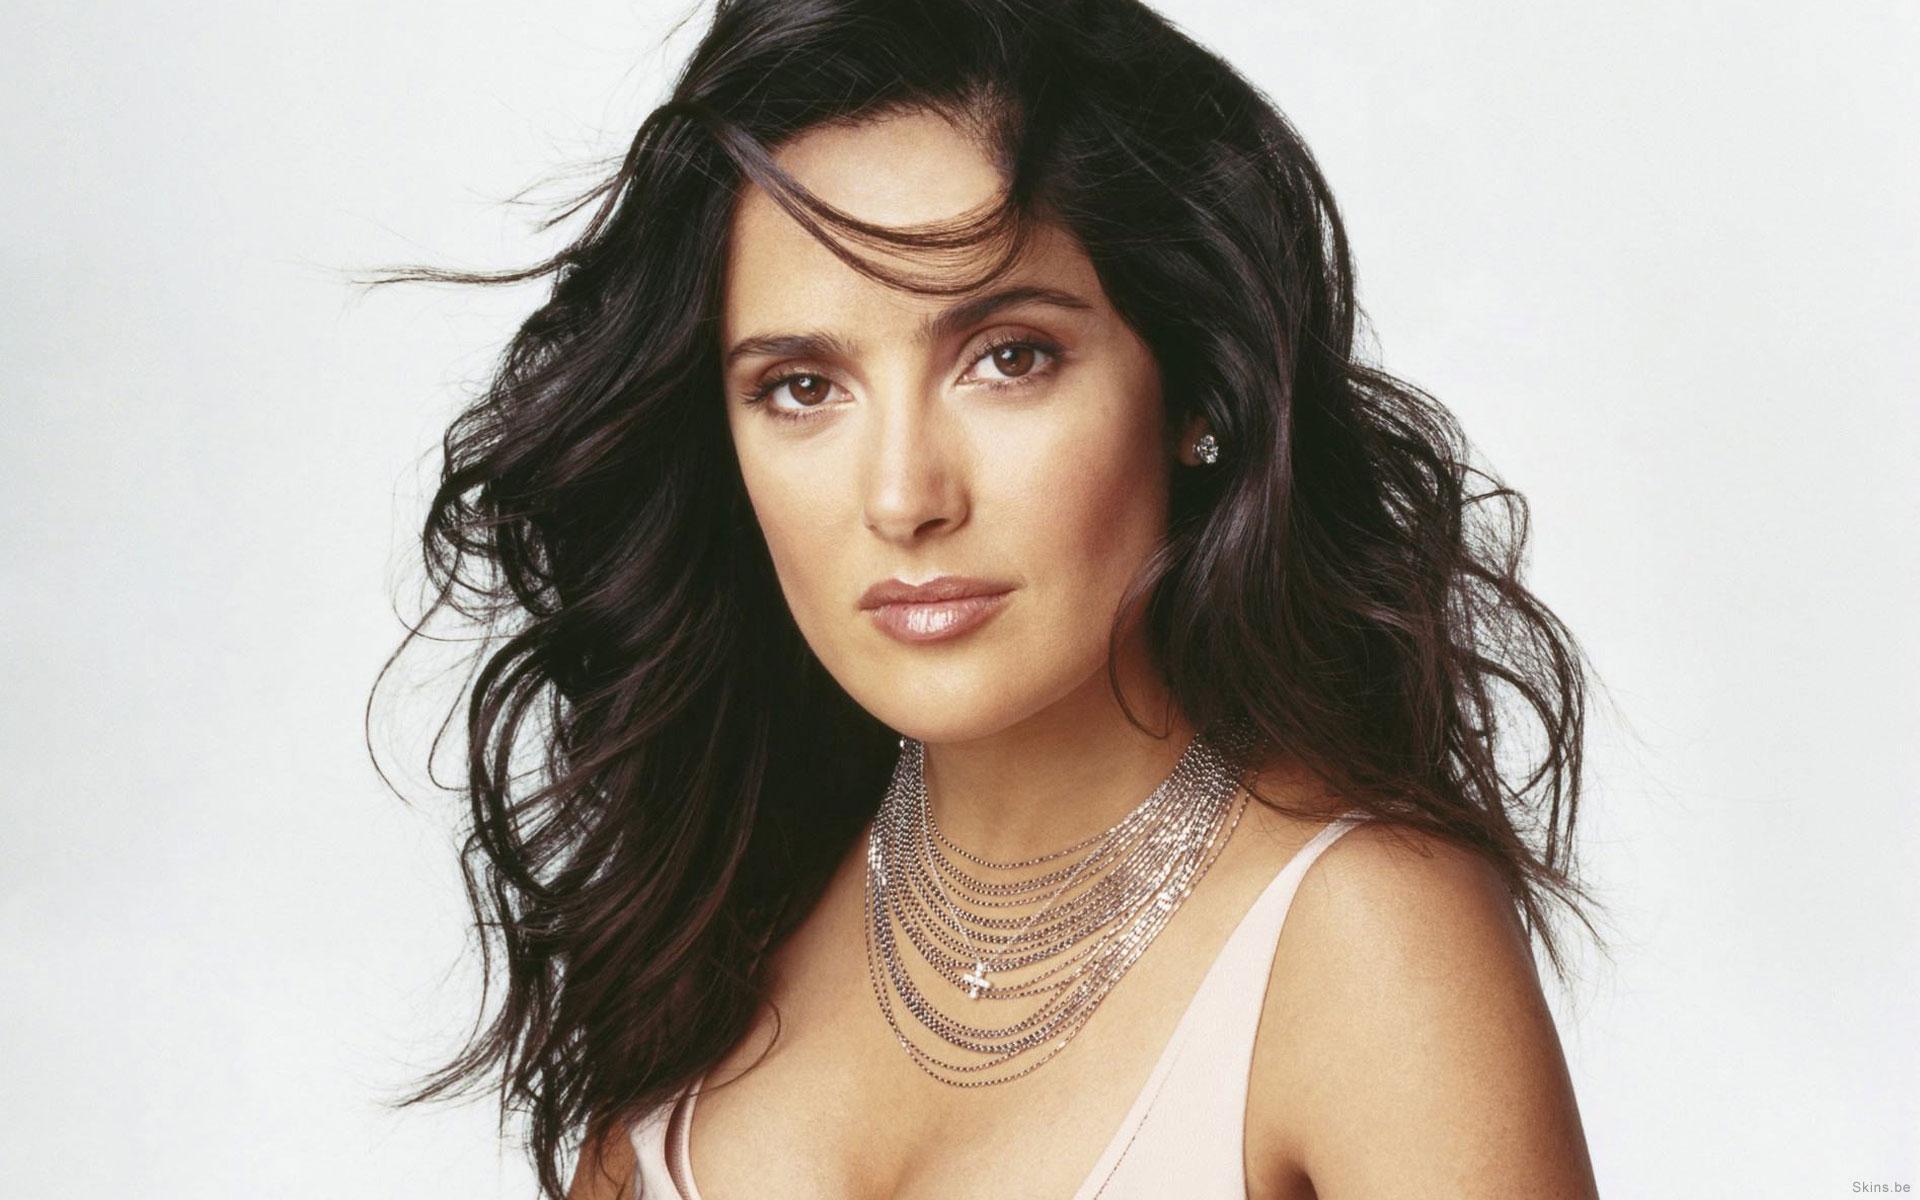 Salma Hayek - CelebHealthy_com